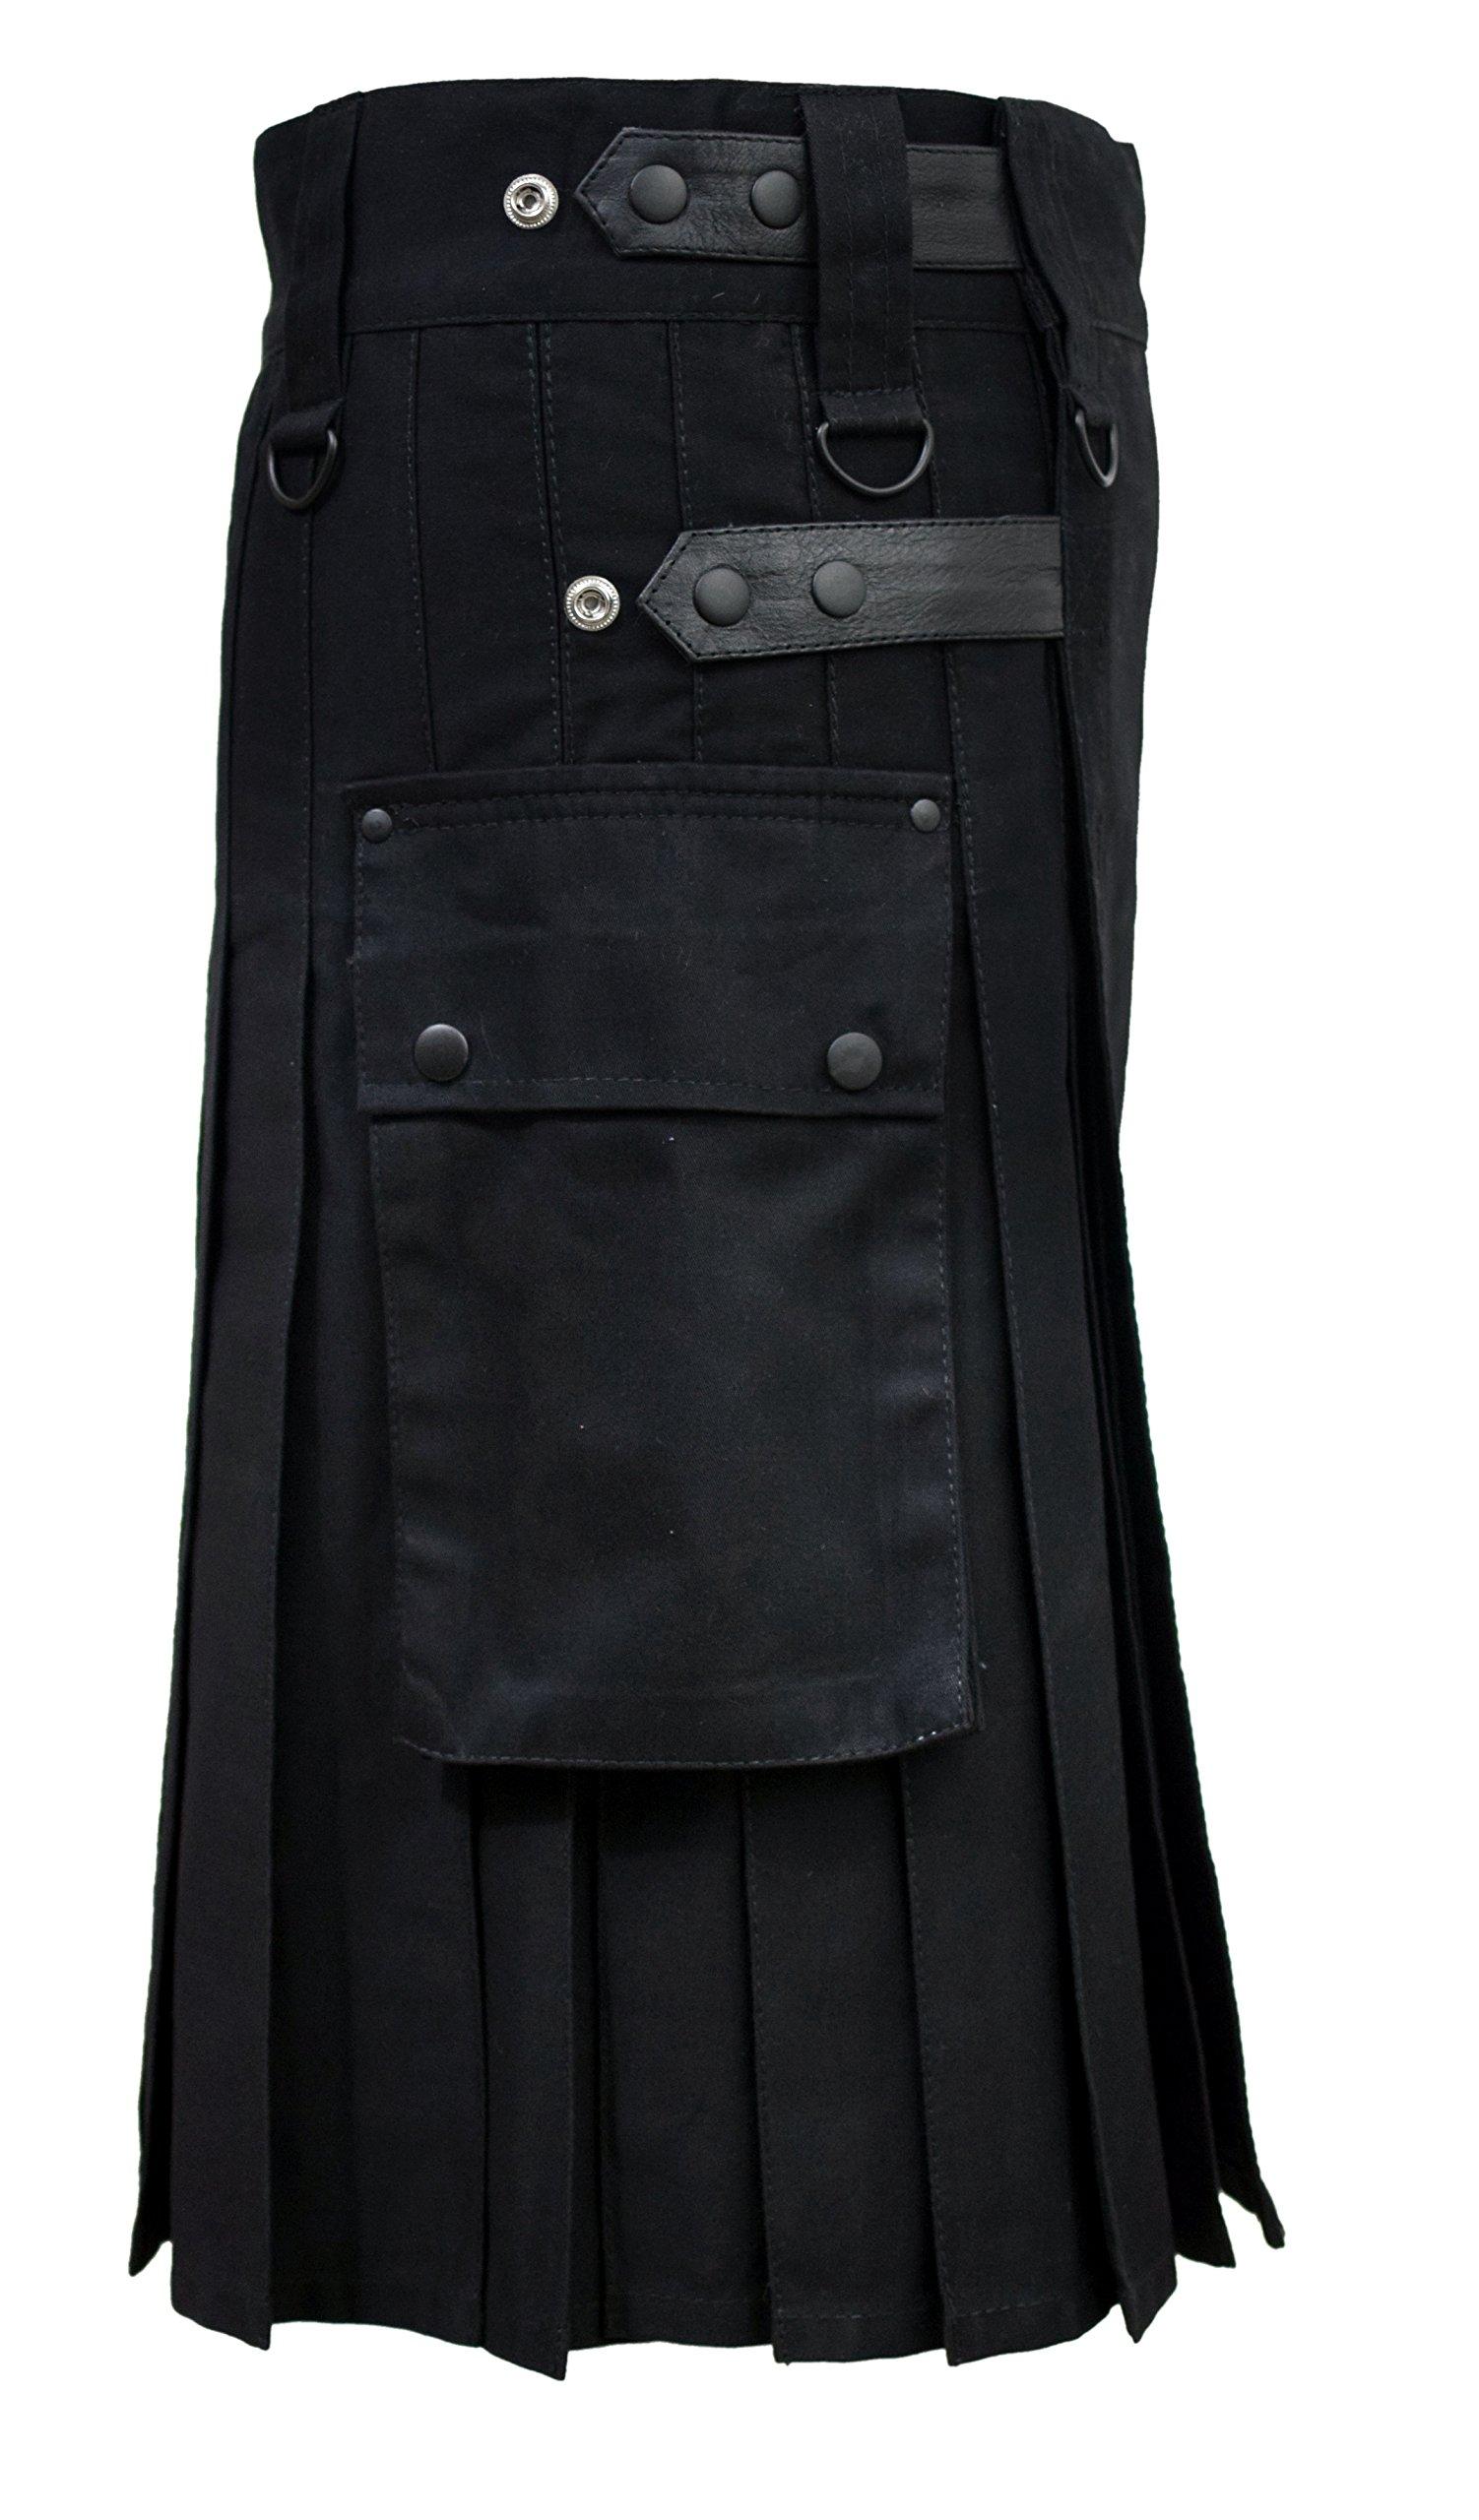 SHYNE Men Black Leather Straps Fashion Sport Utility Kilt Deluxe Kilt Adjustable Sizes (44'')